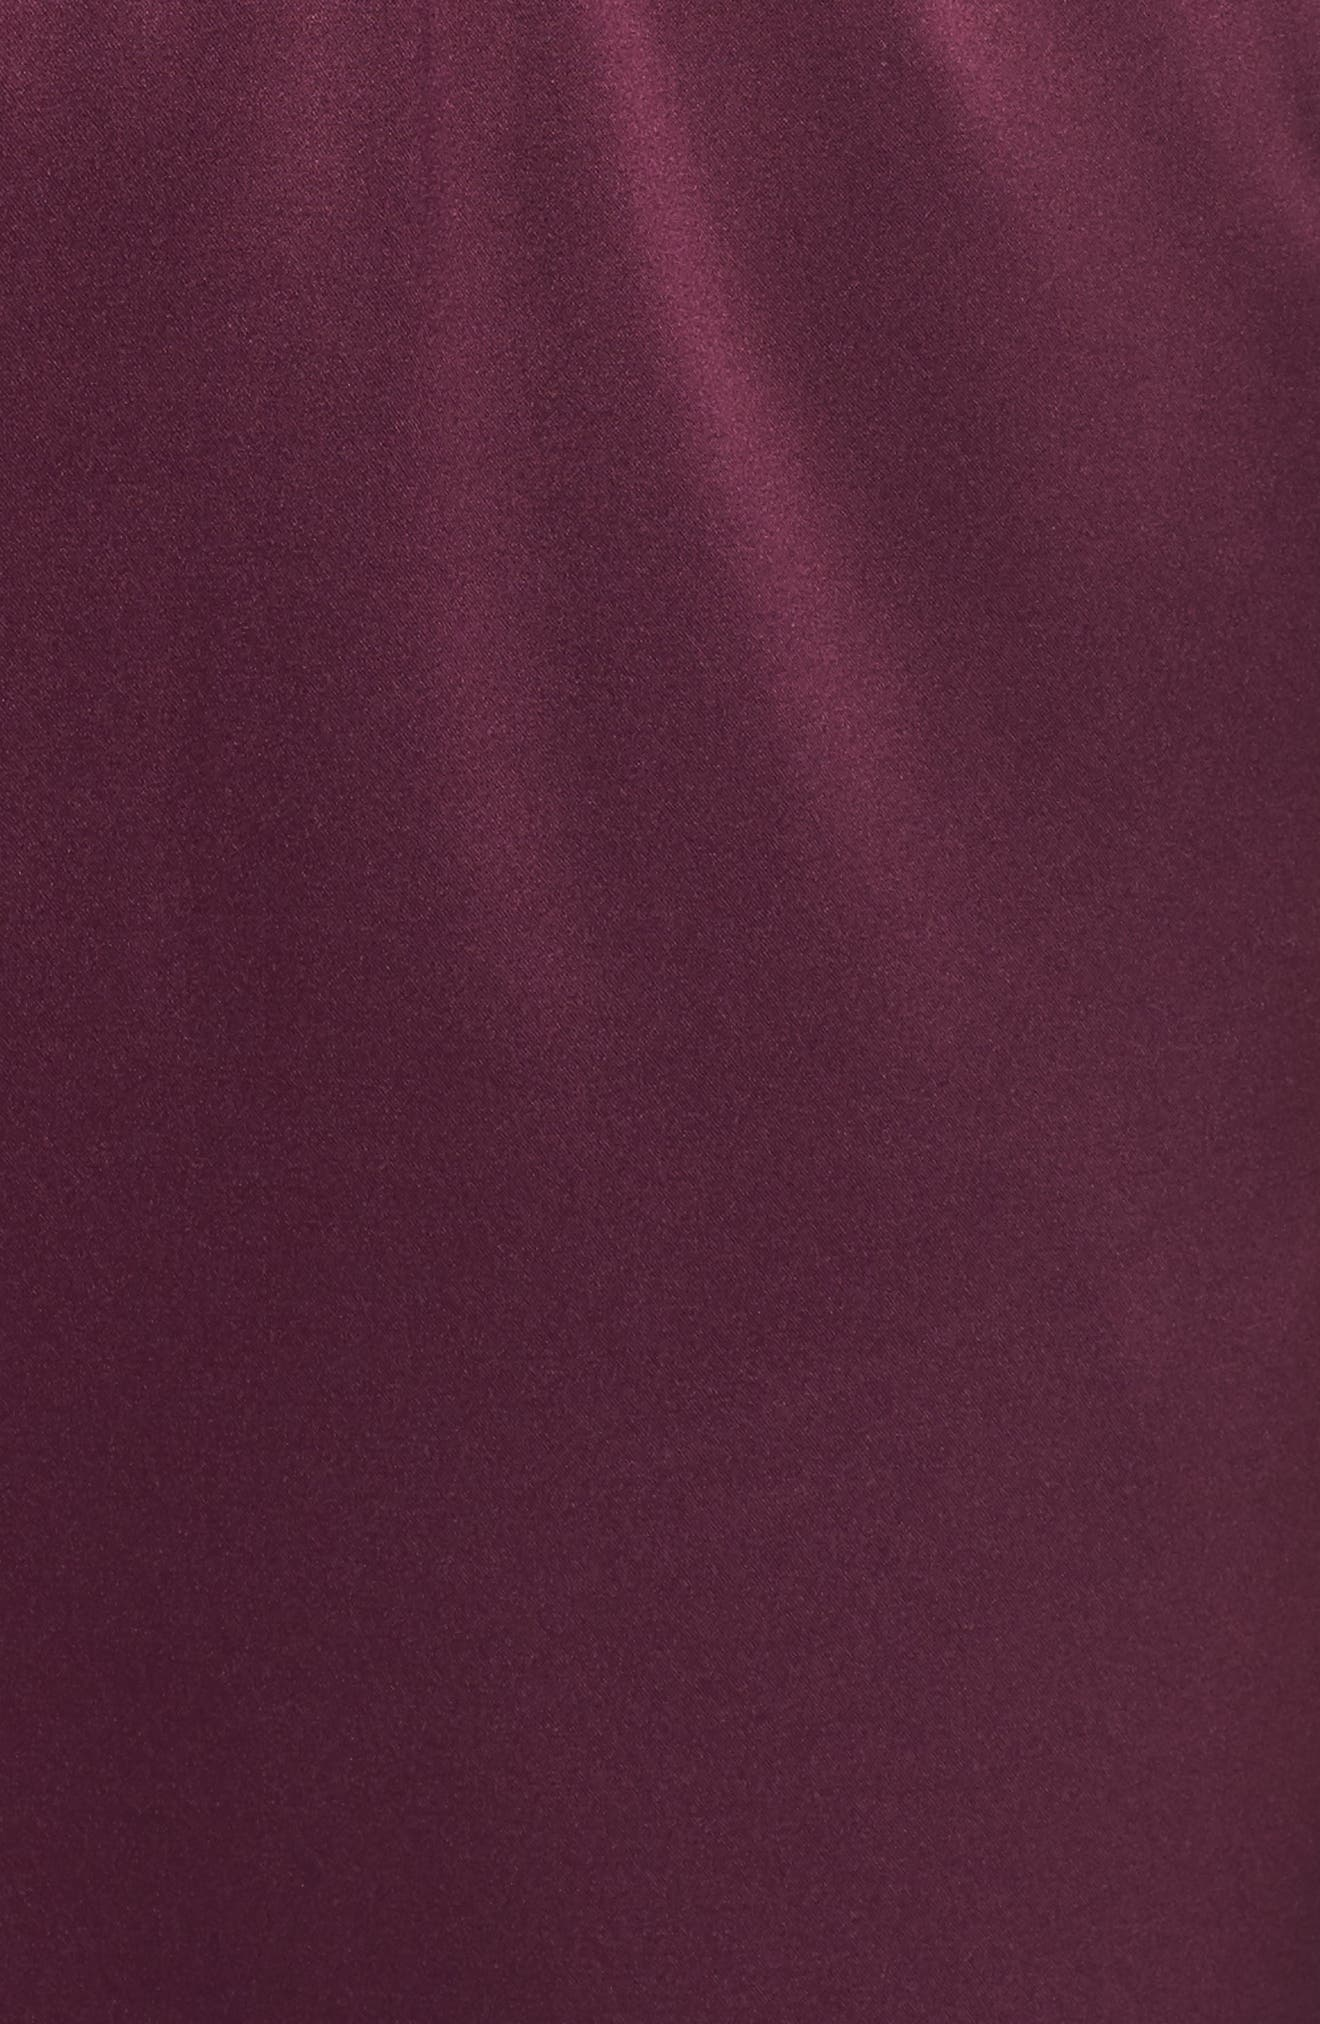 One-Shoulder Jumpsuit,                             Alternate thumbnail 6, color,                             Wine